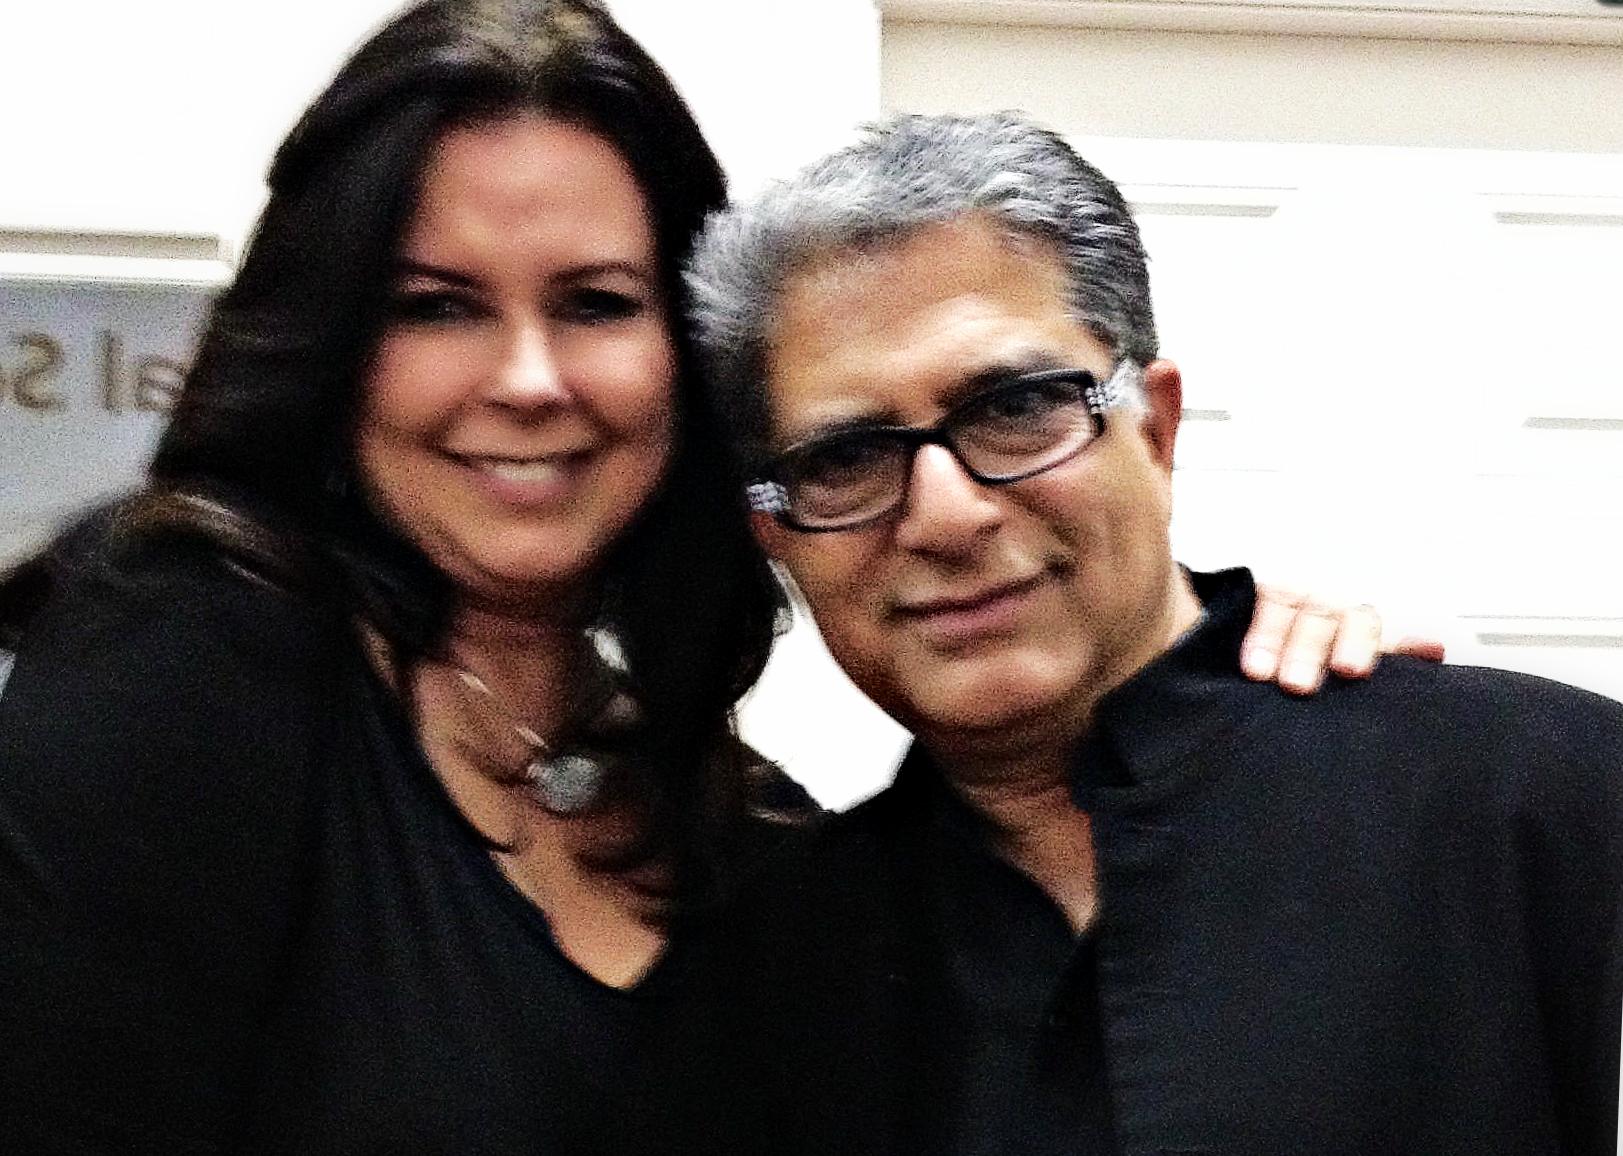 Siobhan McKenna and Deepak Chopra